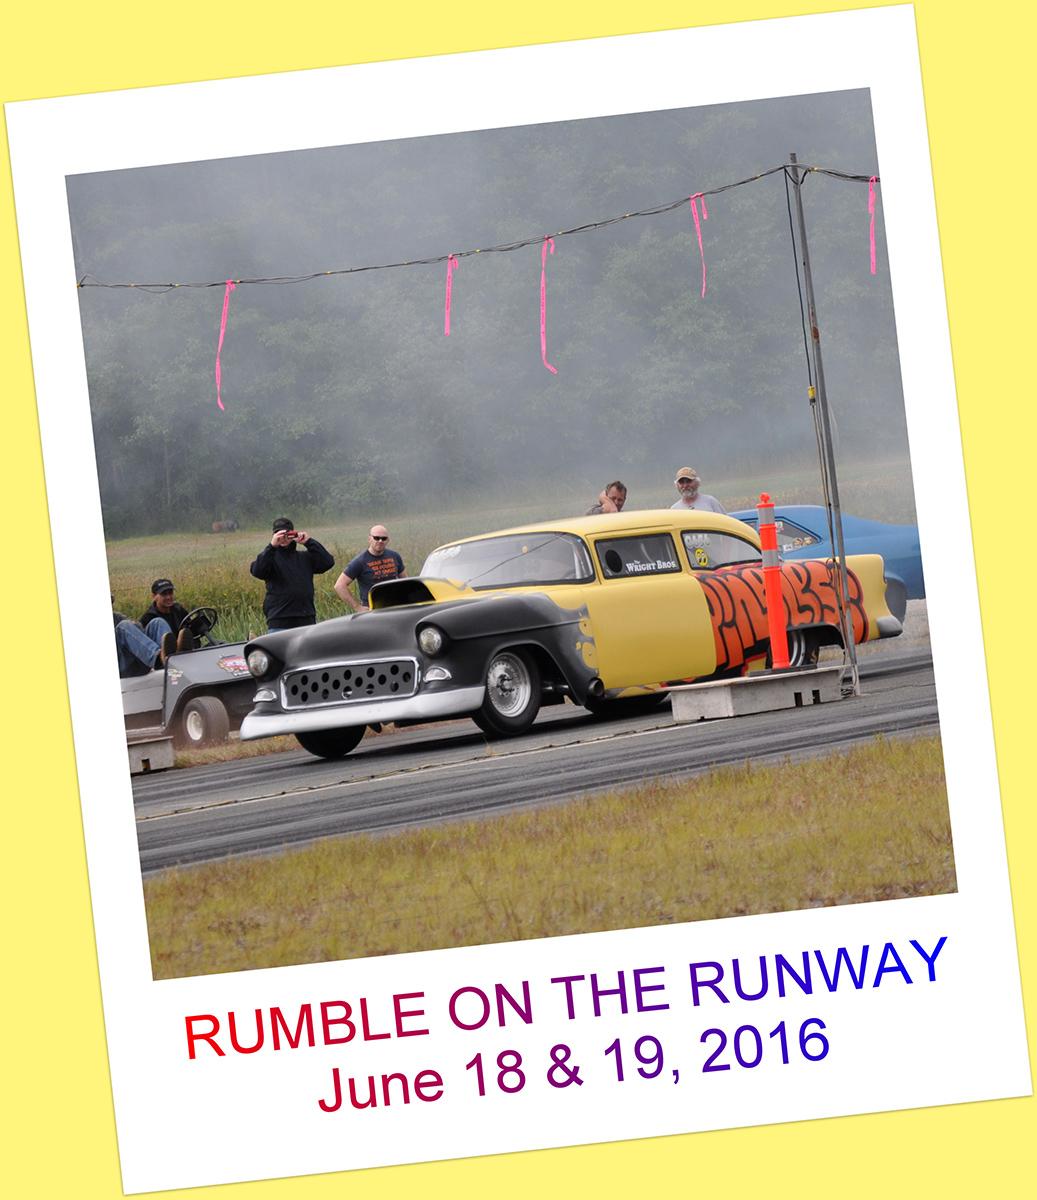 Rumble on the Runway June 18 & 19, 2016 1122